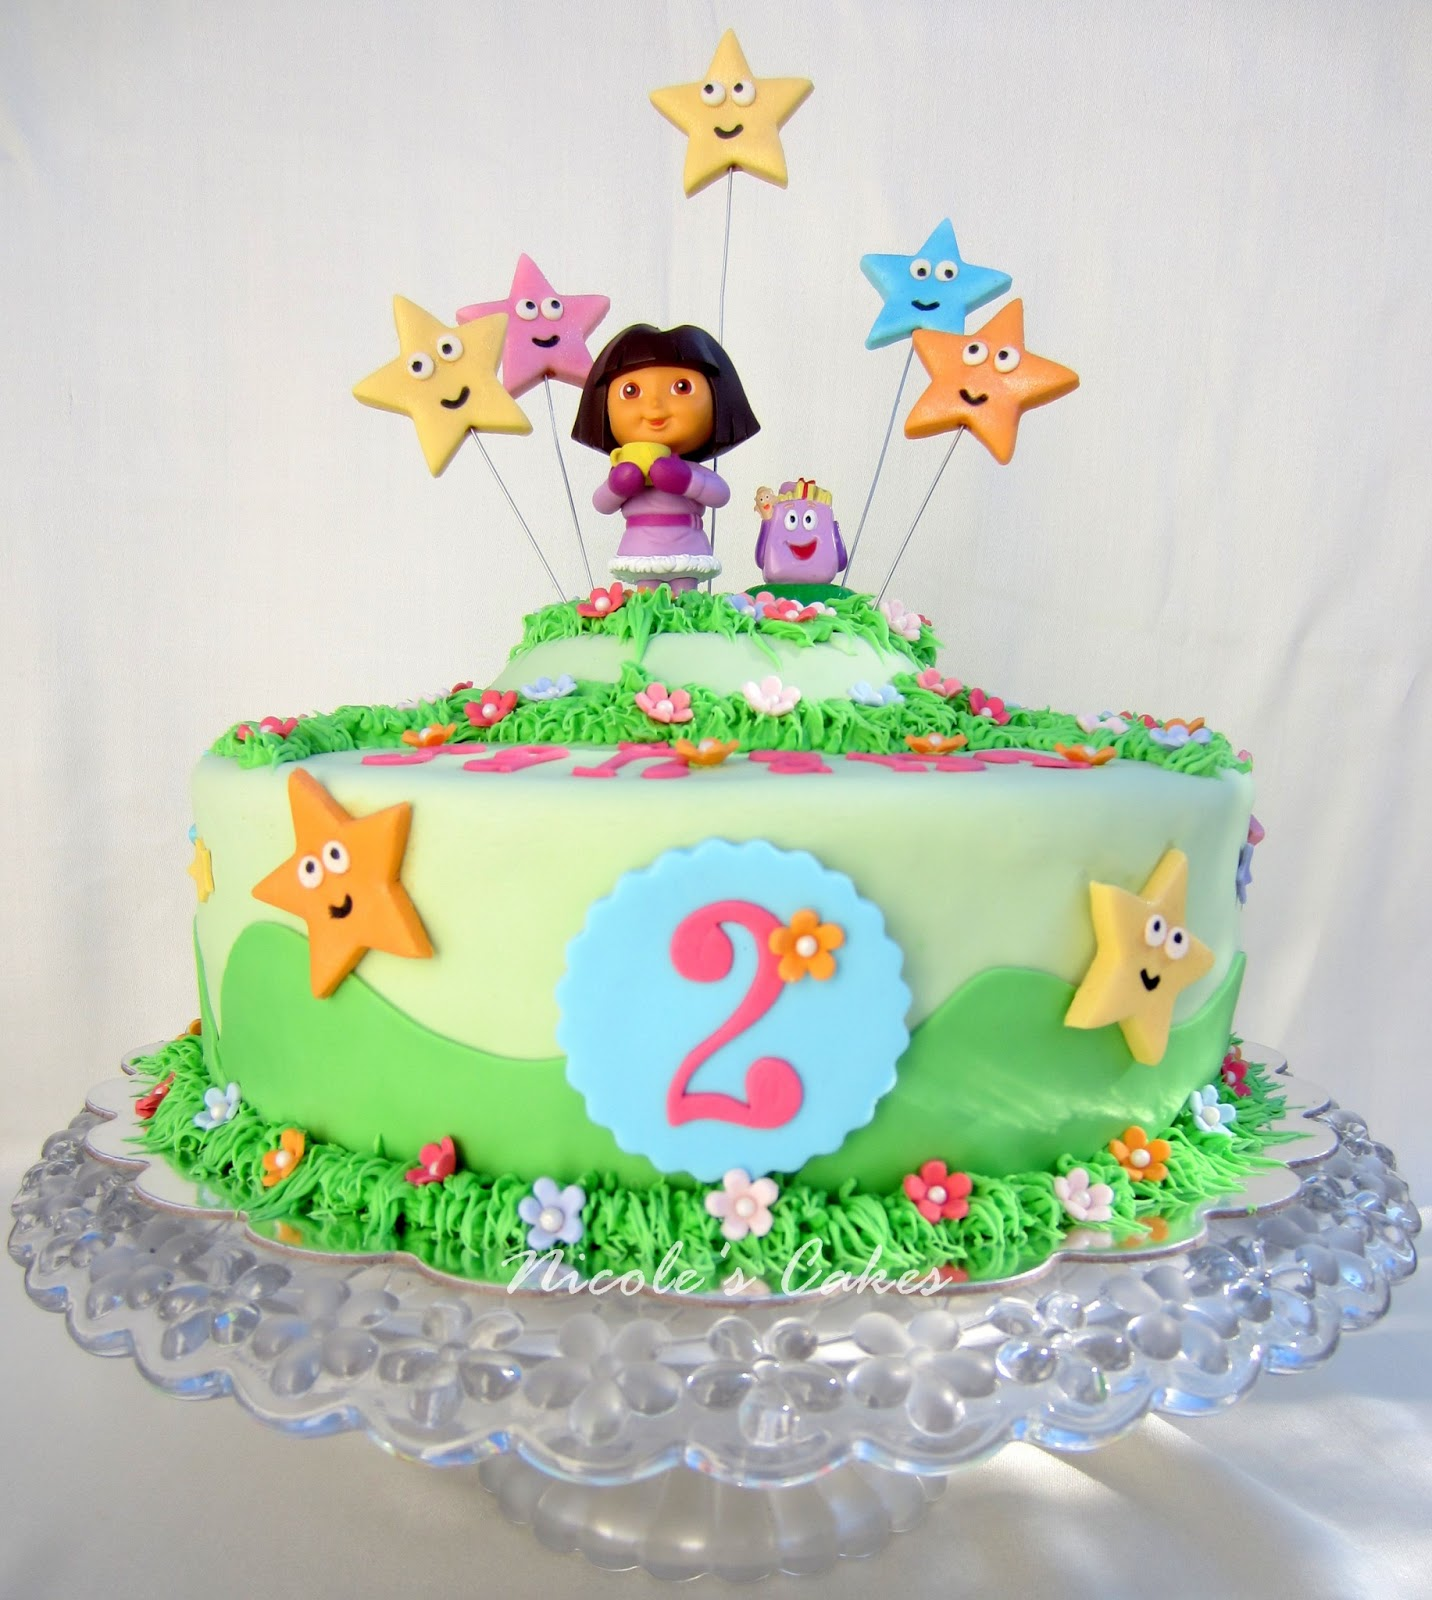 On Birthday Cakes Dora The Explorer Birthday Cake